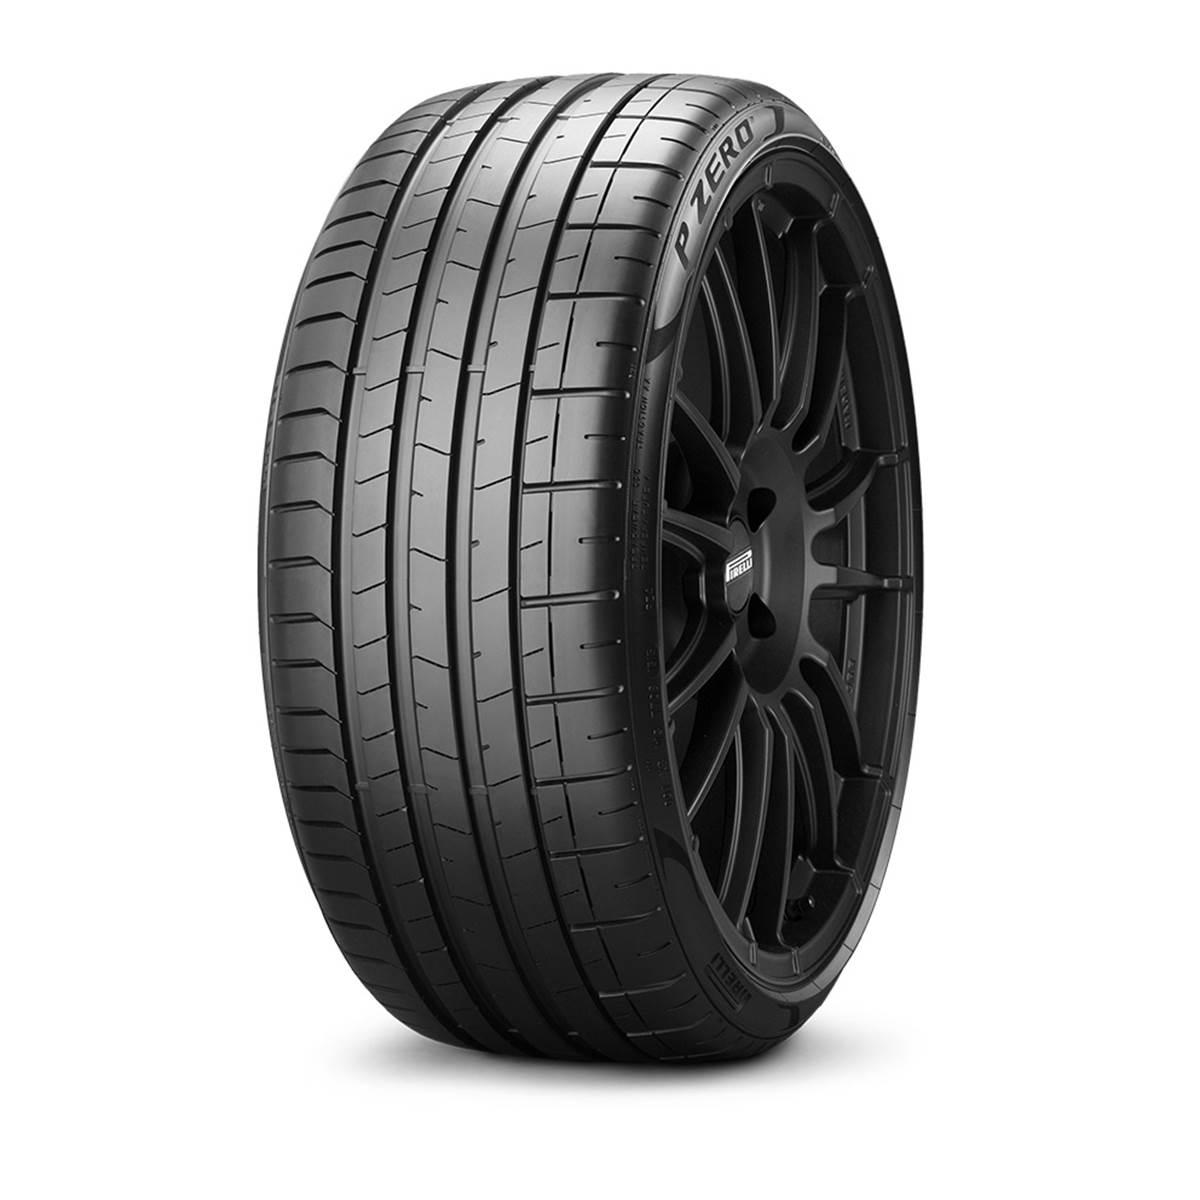 Pneu Pirelli 305/35R19 102Y P ZERO L